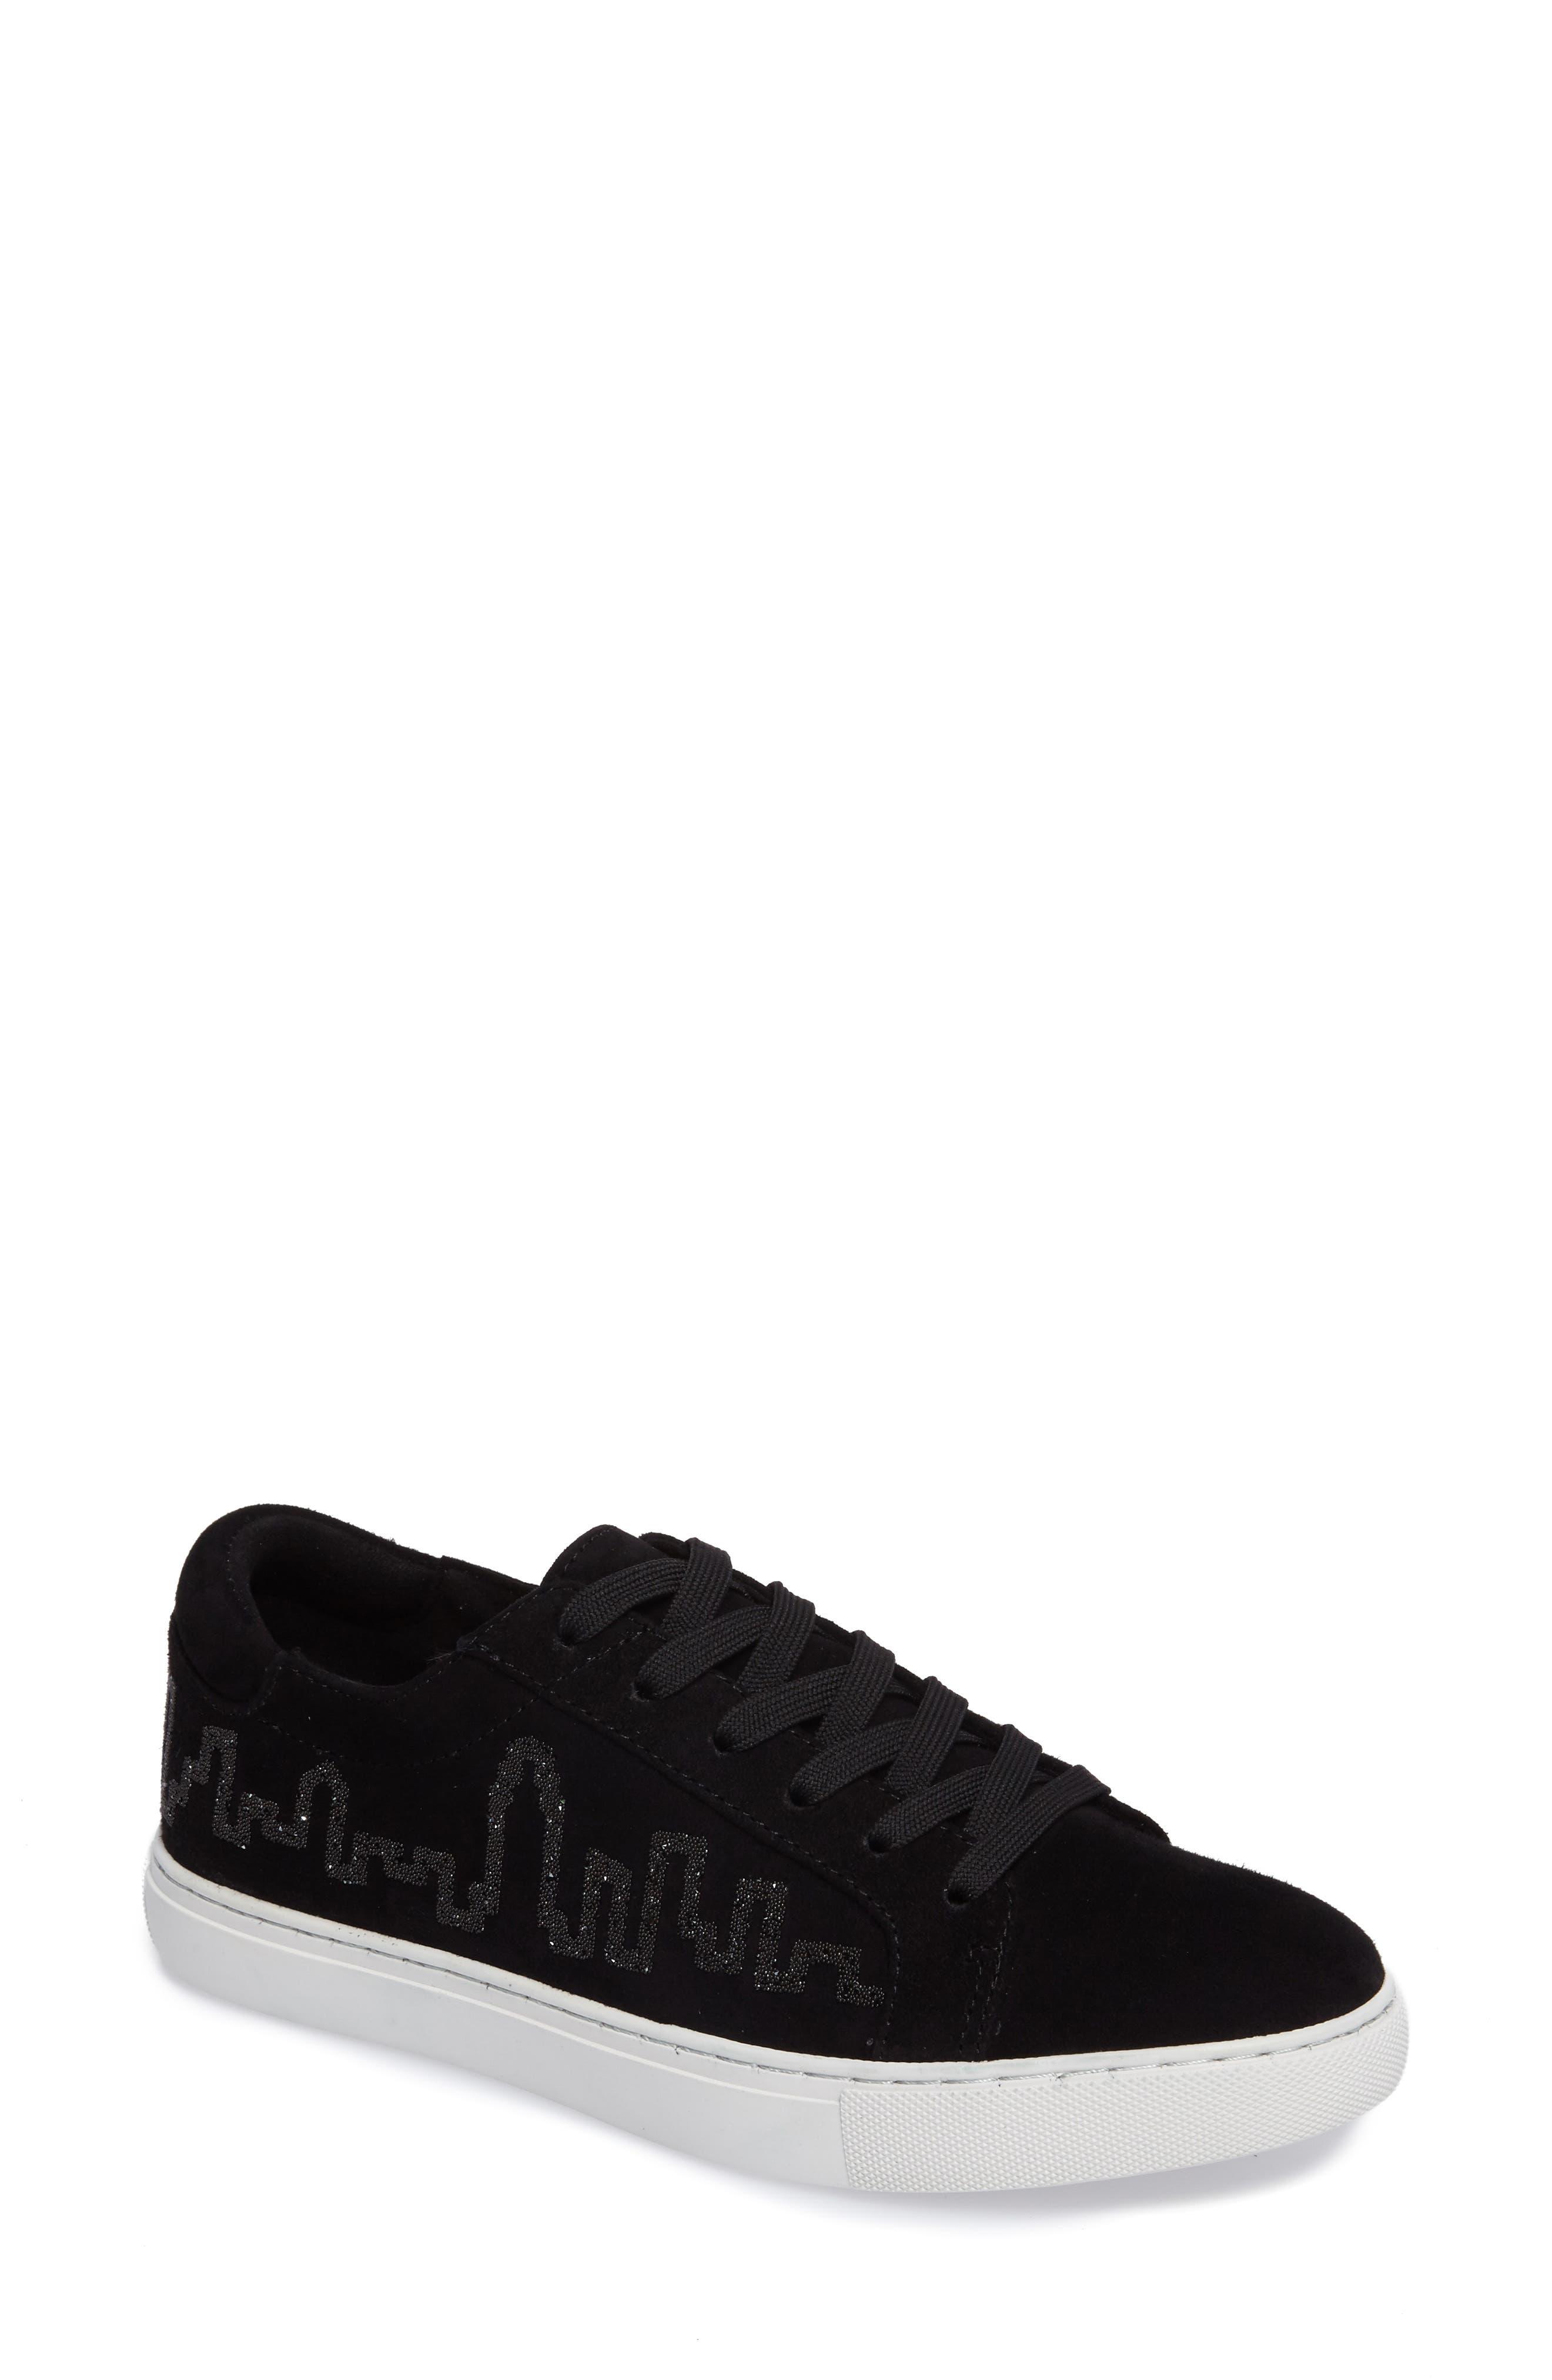 Alternate Image 1 Selected - Kenneth Cole New York Kam Sky Techni-Cole™ Sneaker (Women)